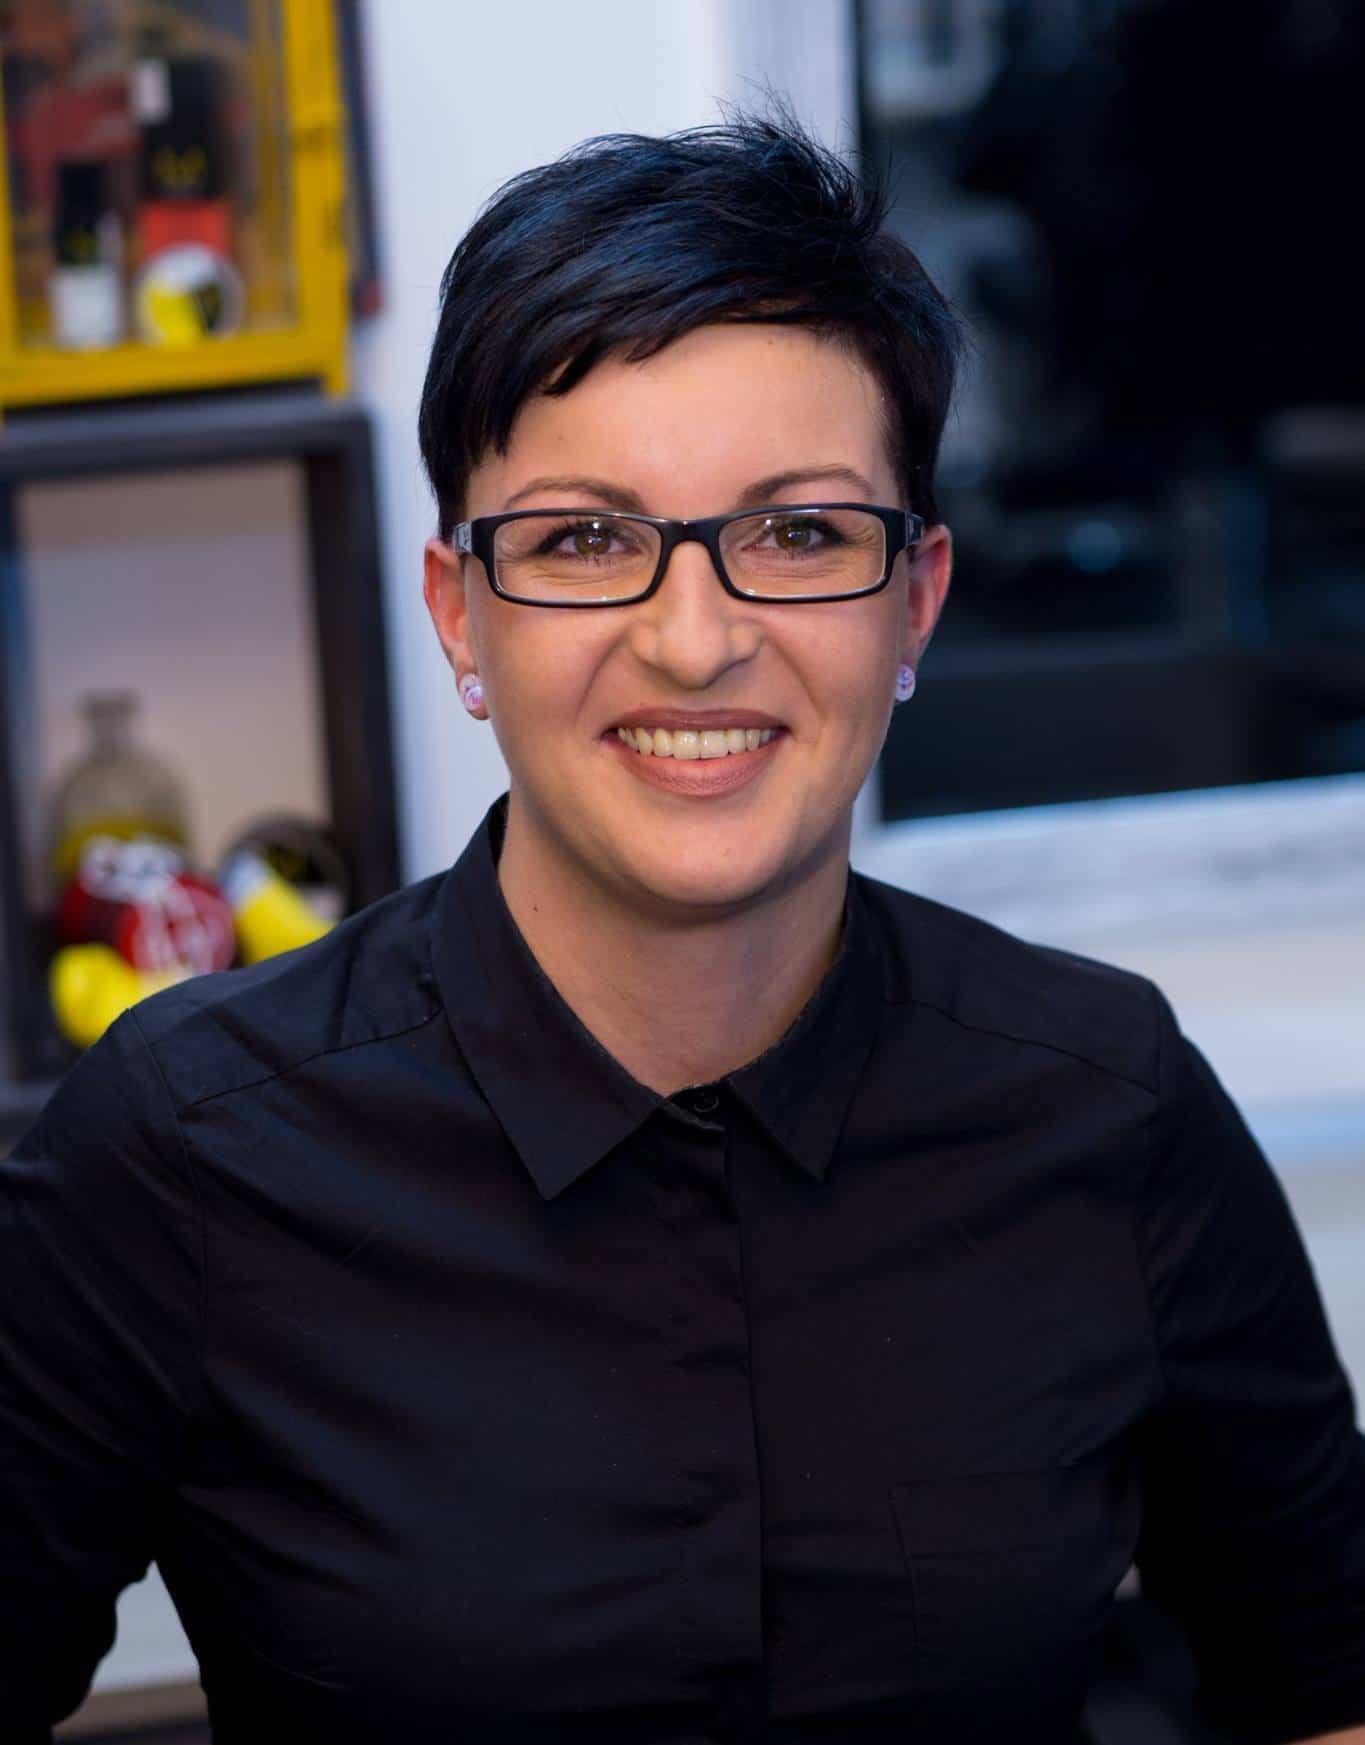 Nina Lindler - Der stylische Friseur in Bayreuth